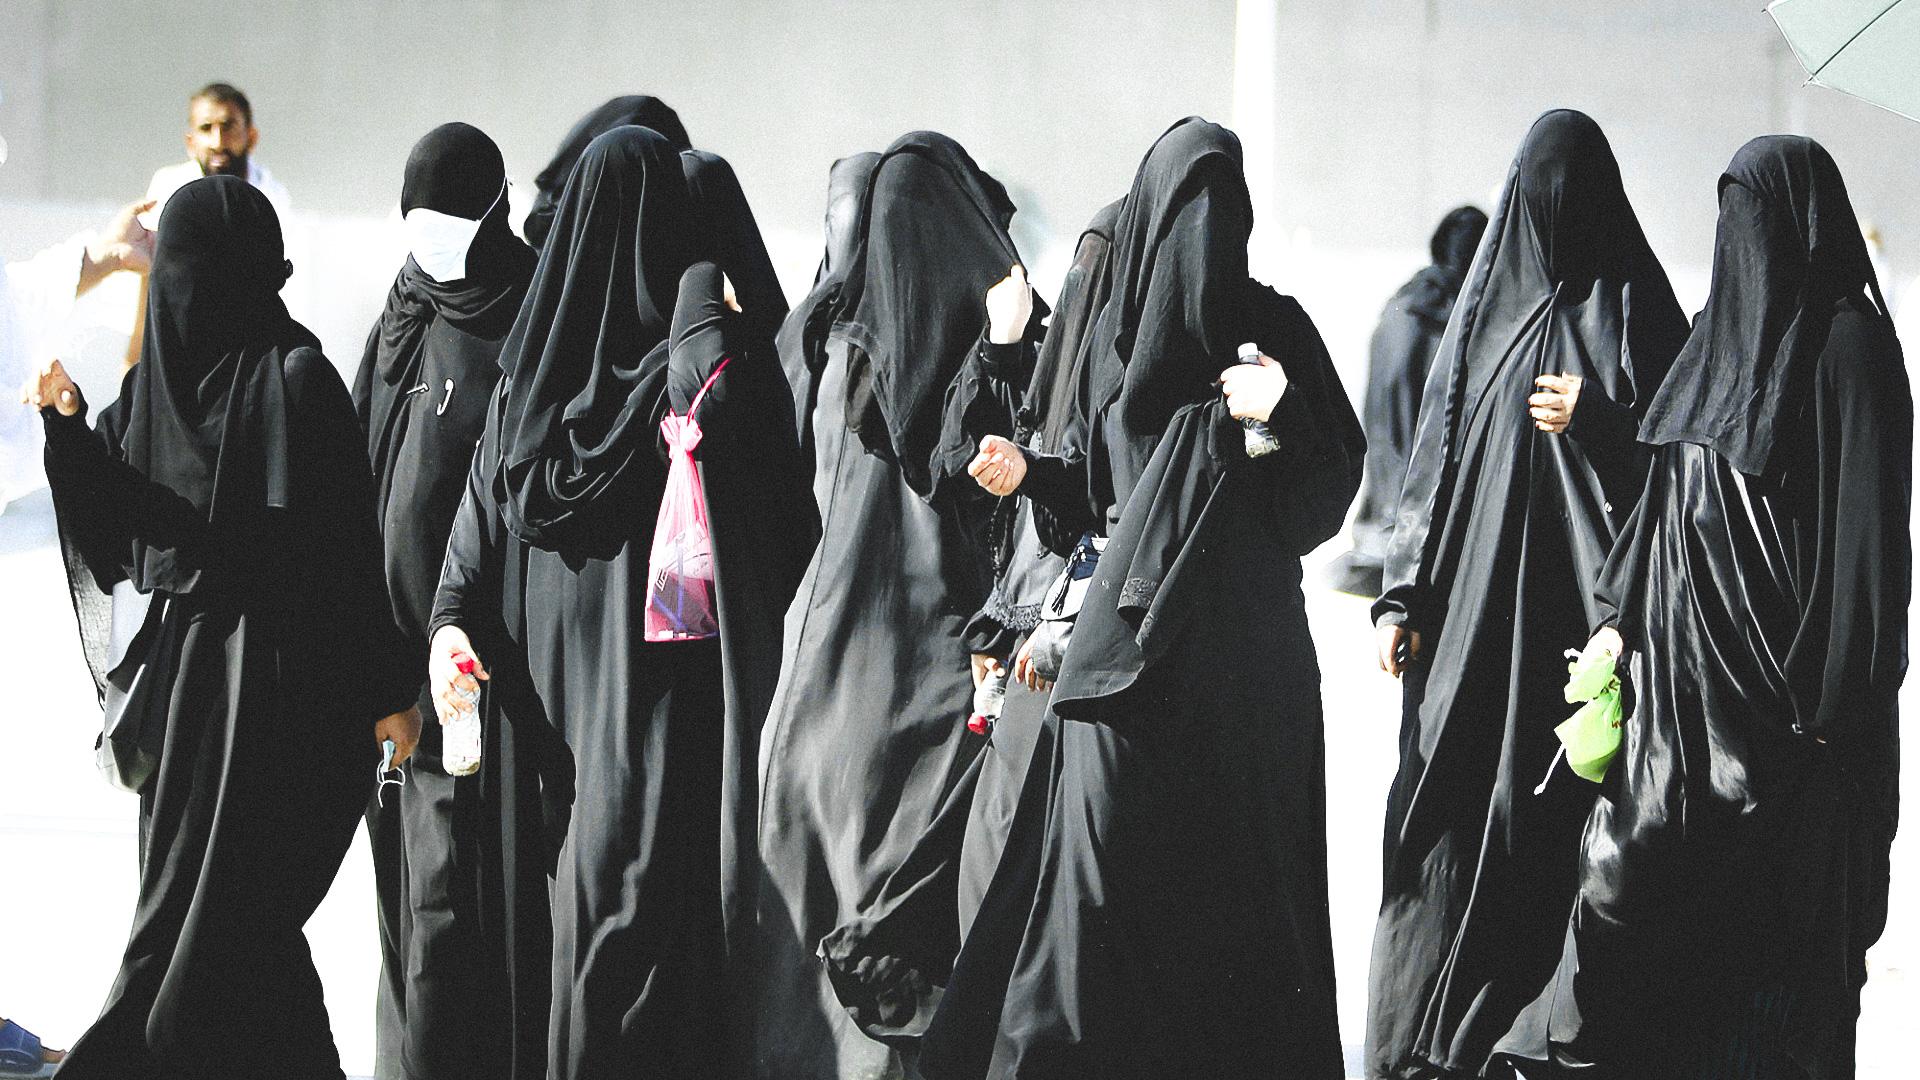 نساء منقبات - برقع